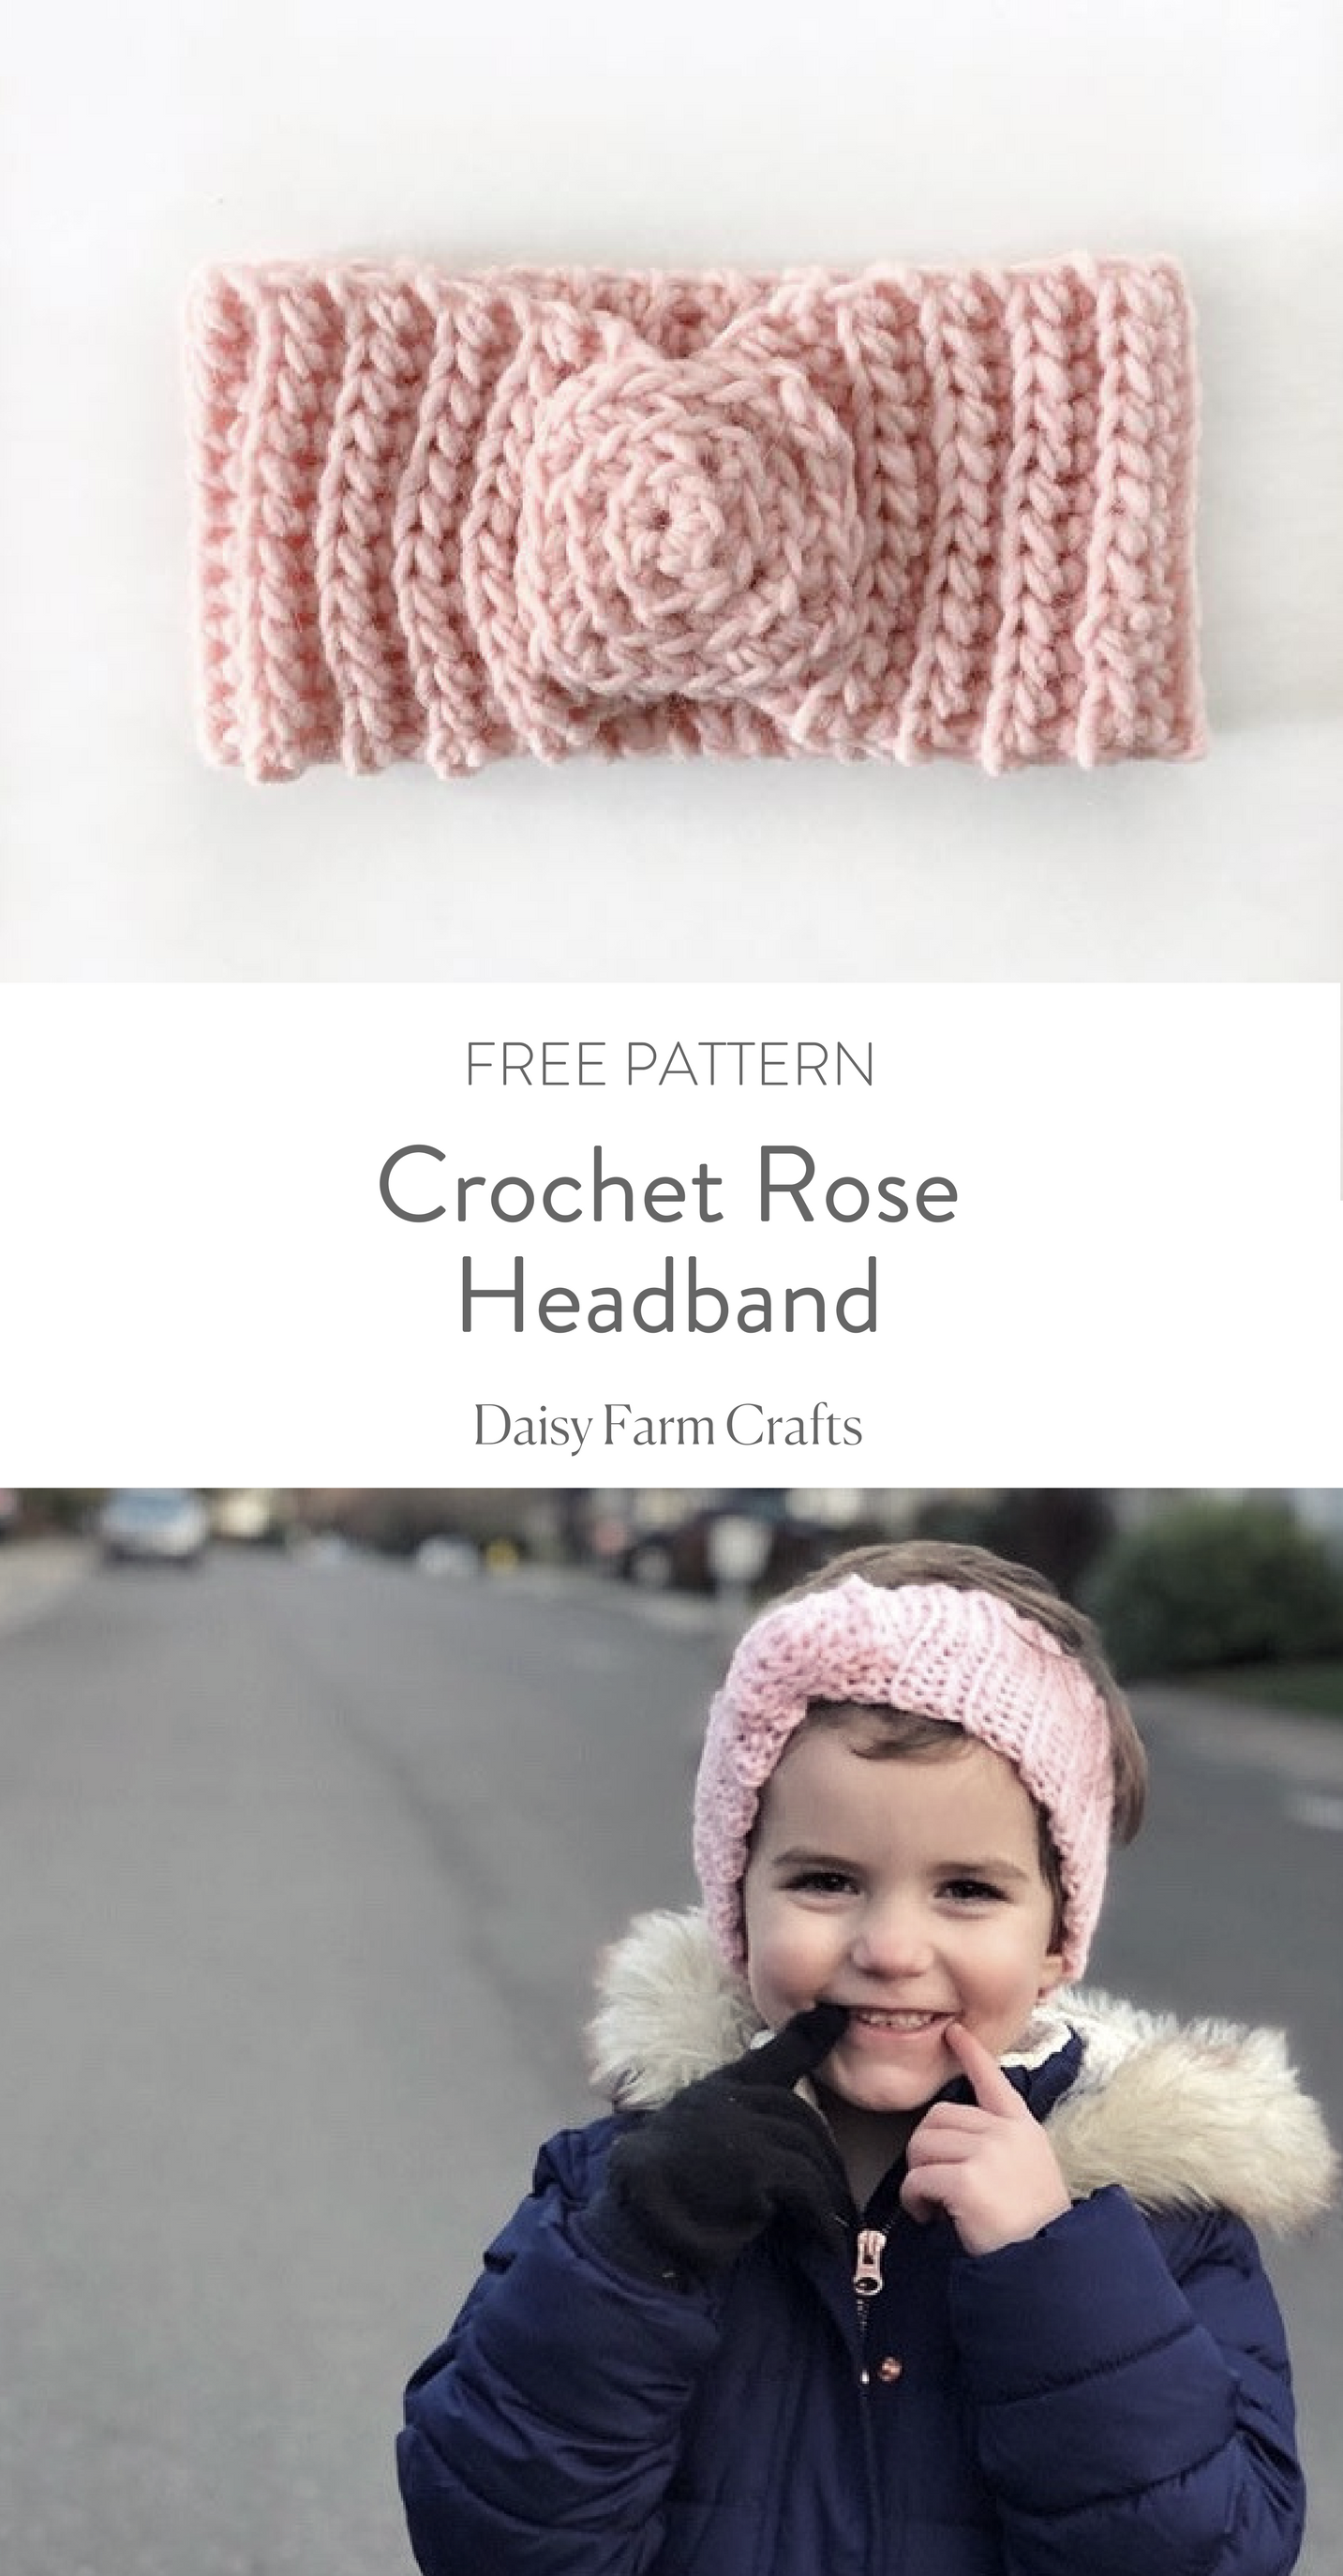 Crochet Rose Headband - Free Pattern | Daisy Farm Crafts | Pinterest ...